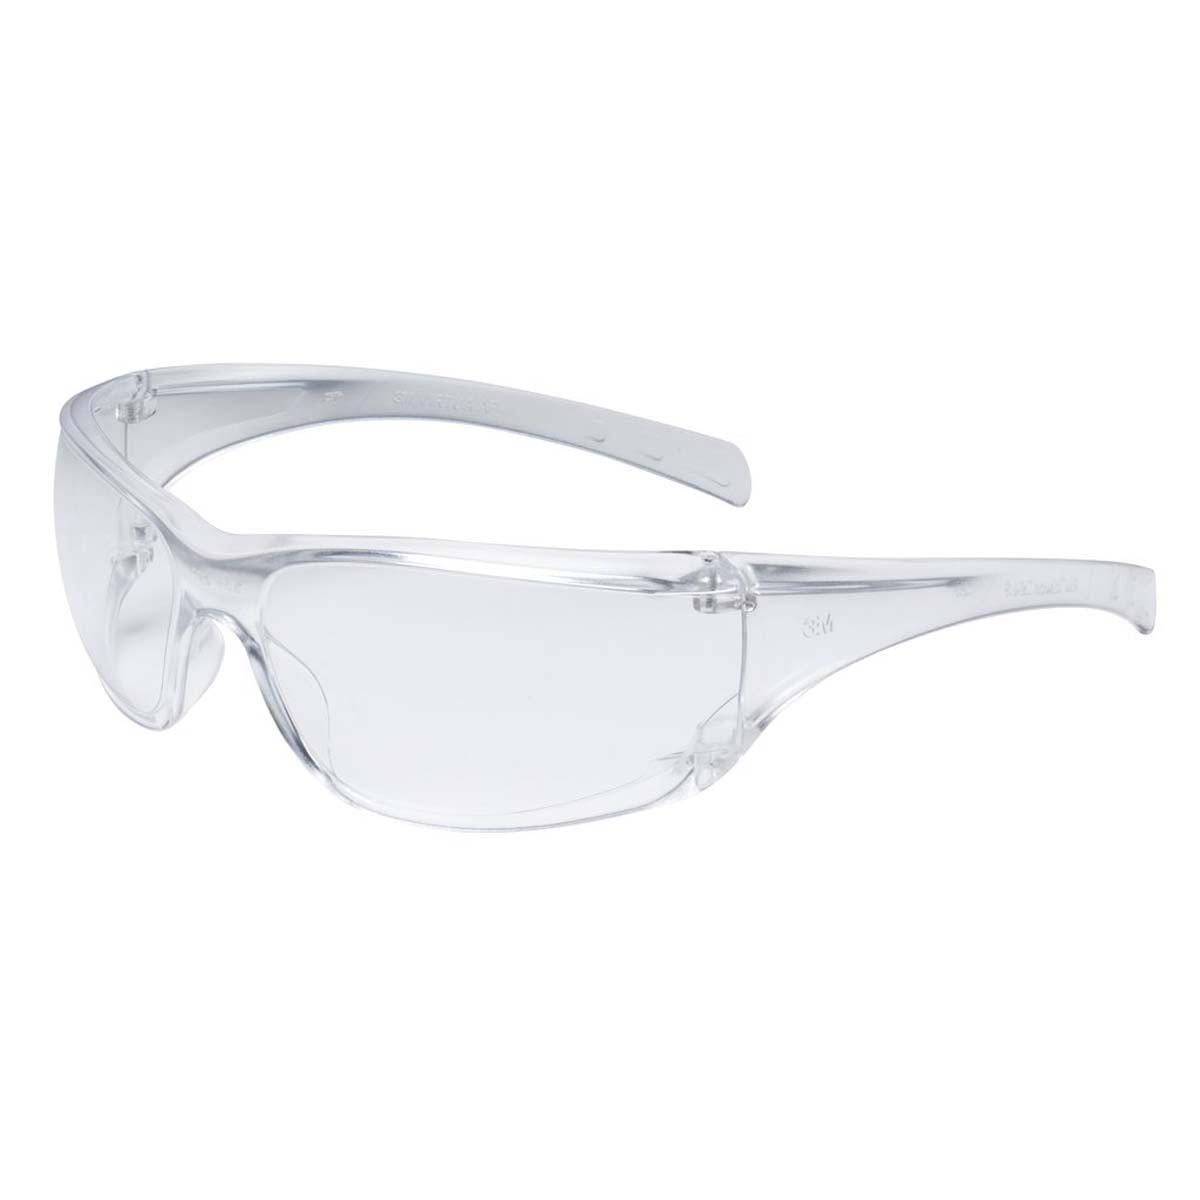 3M Virtua AP Protective Eyewear 11818-00000-20, Clear Anti-Fog Lens,